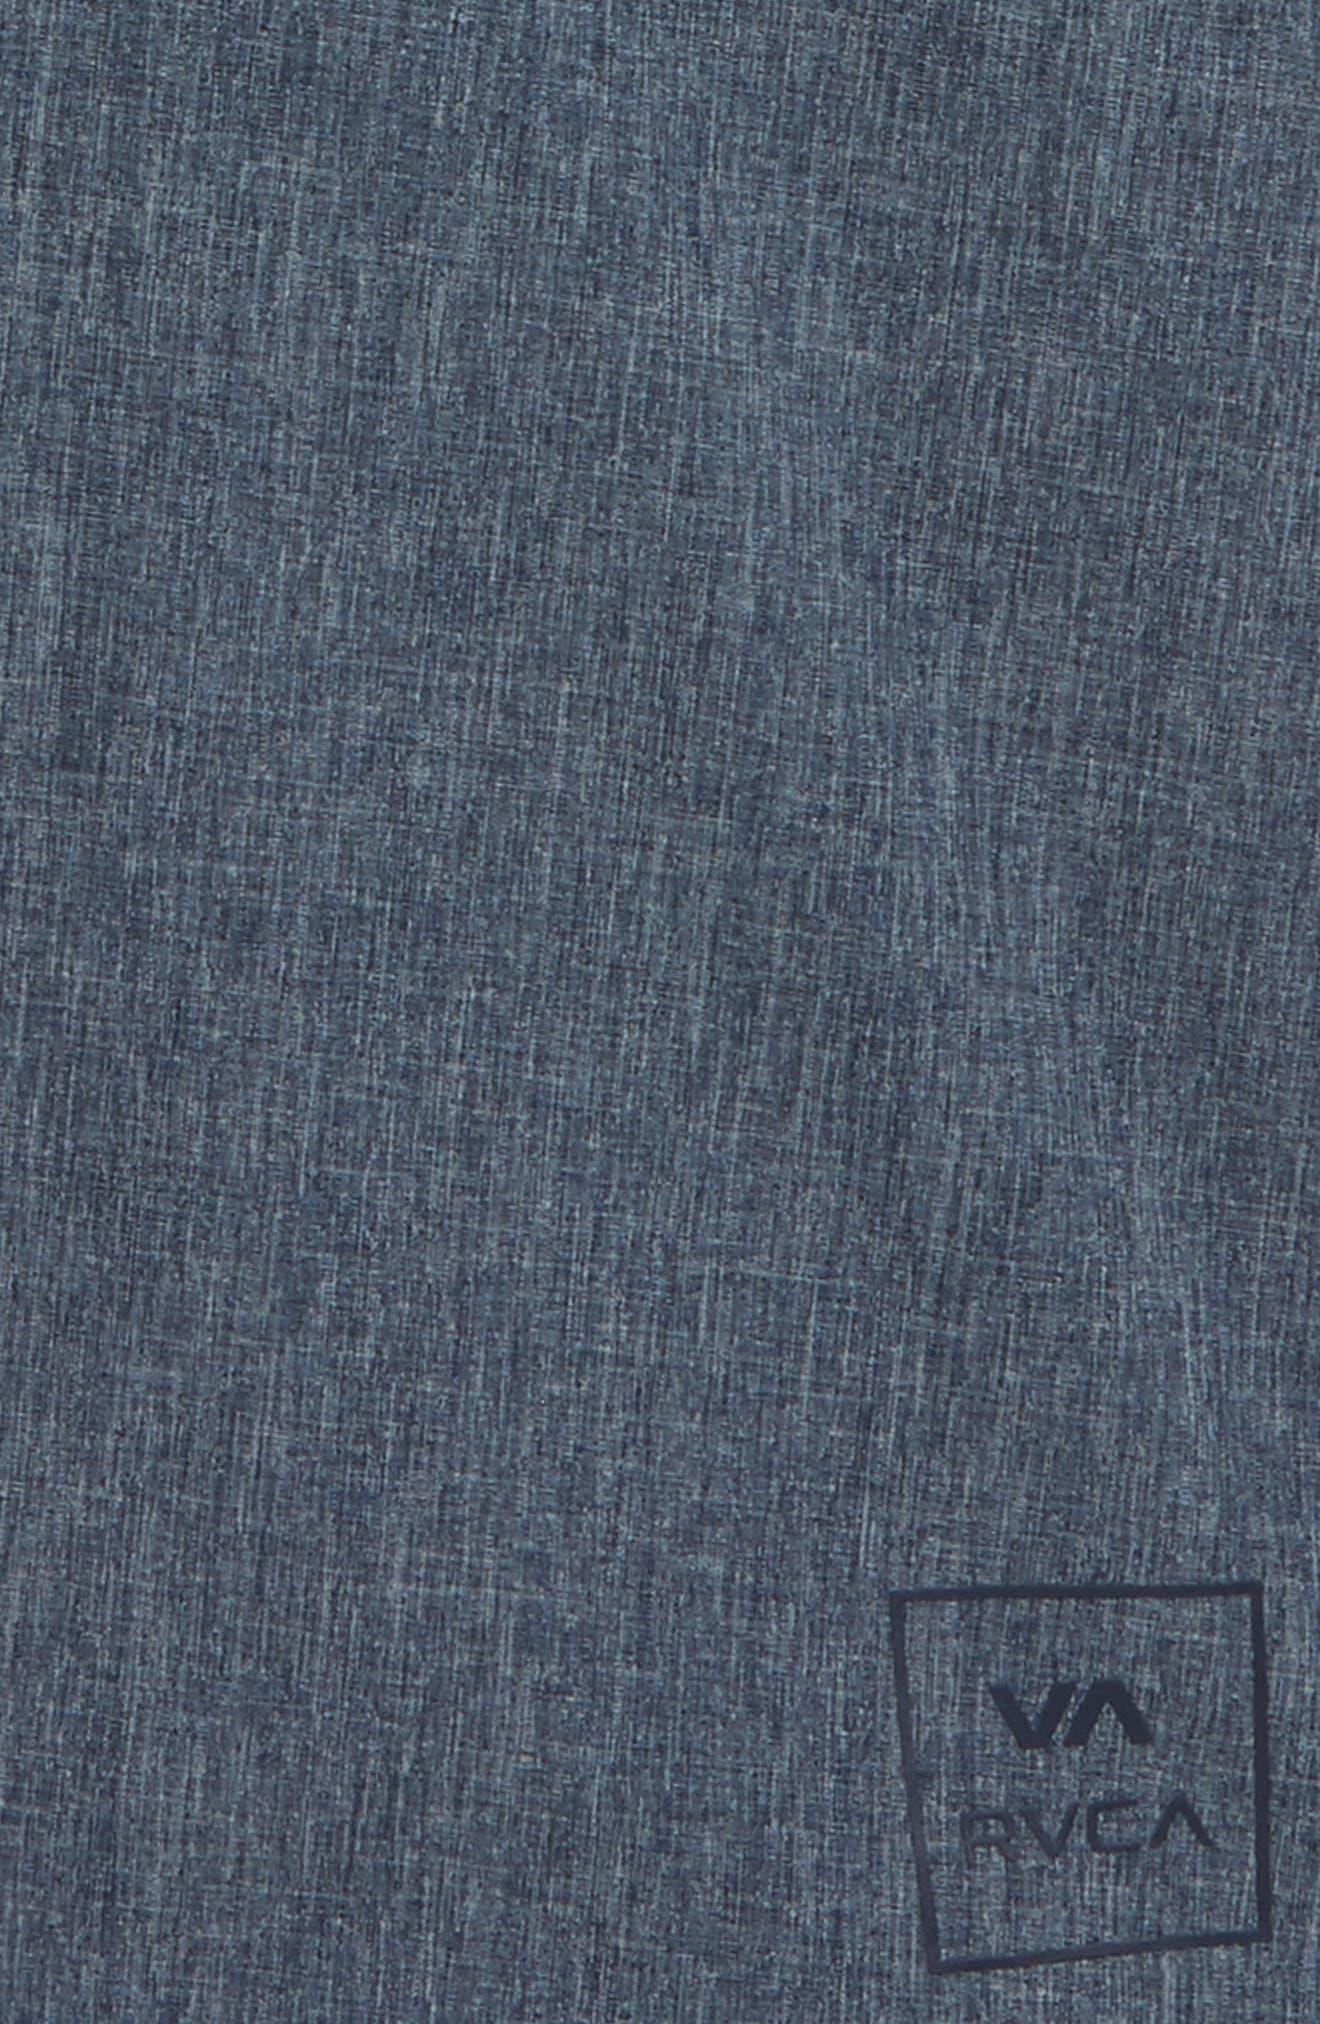 All the Way Hybrid Shorts,                             Alternate thumbnail 2, color,                             Classic Indigo